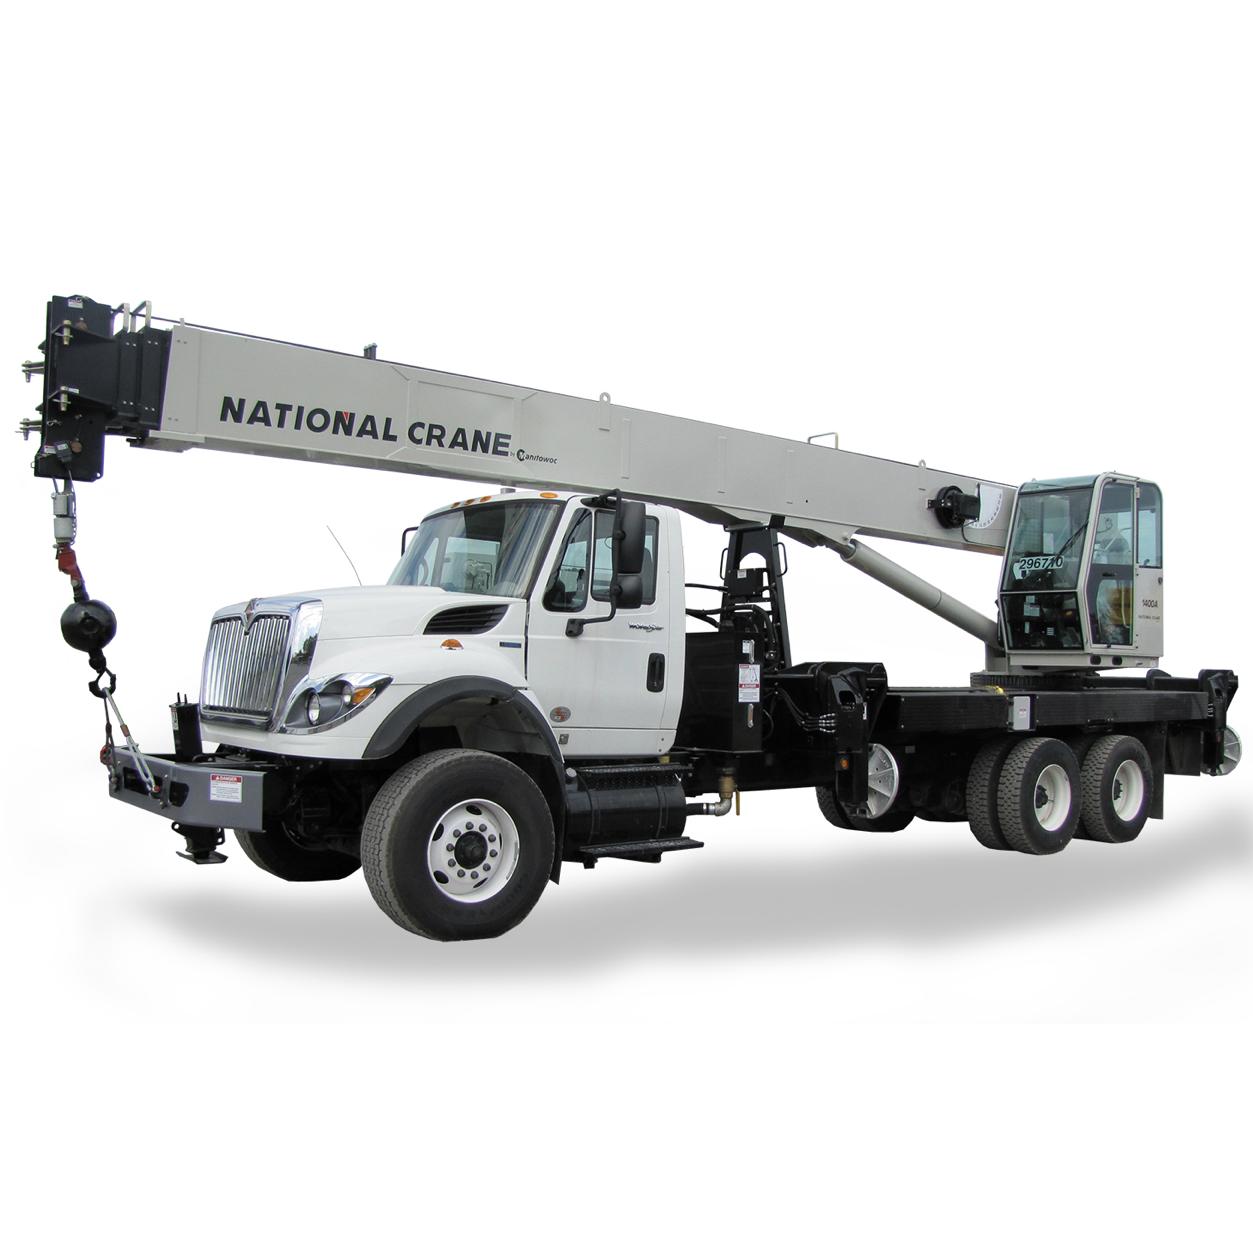 Wilkerson Crane Rental - Equipment - National 1400A